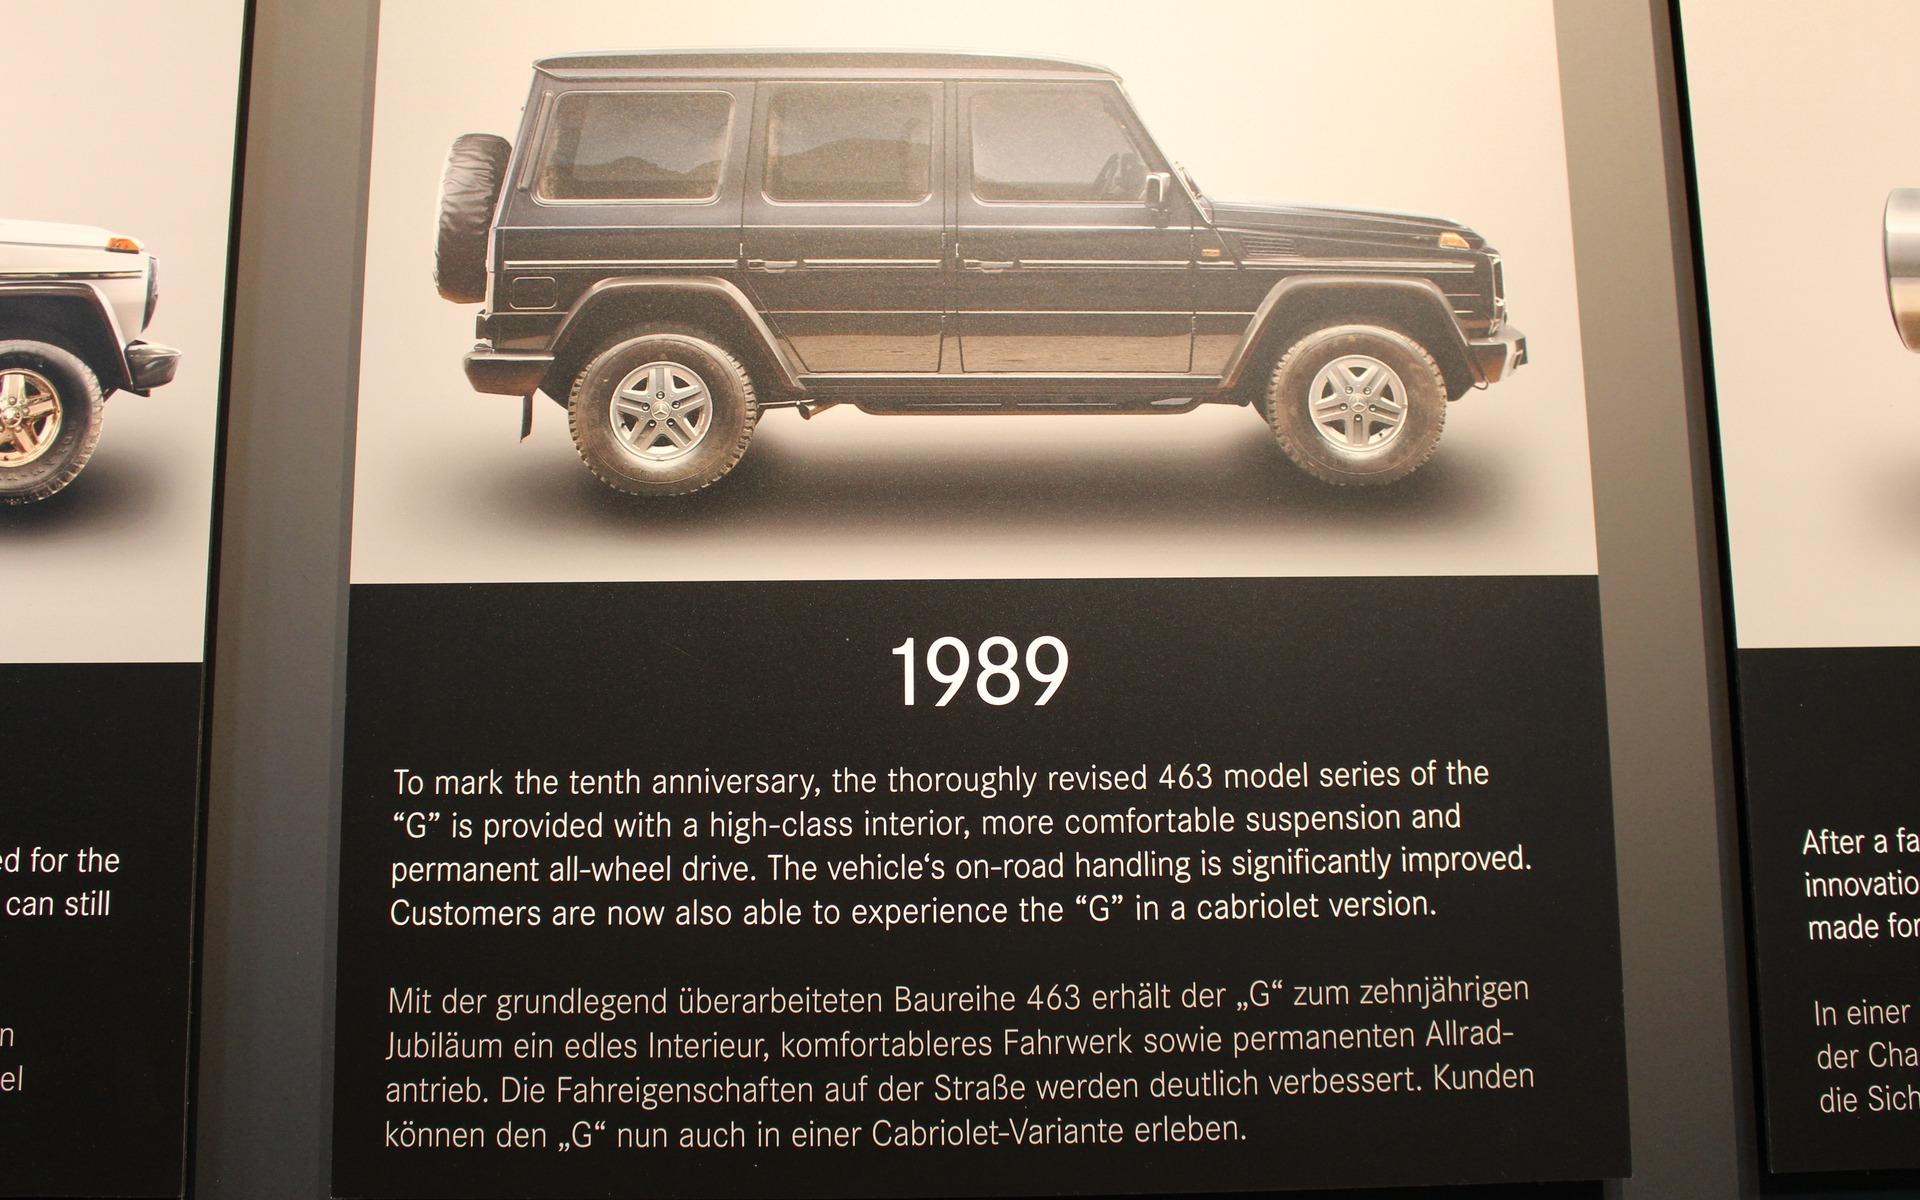 G Mercedes 2019 >> 2019 Mercedes-Benz G-Class: a Major Redesign, 40 Years Later - 11/17